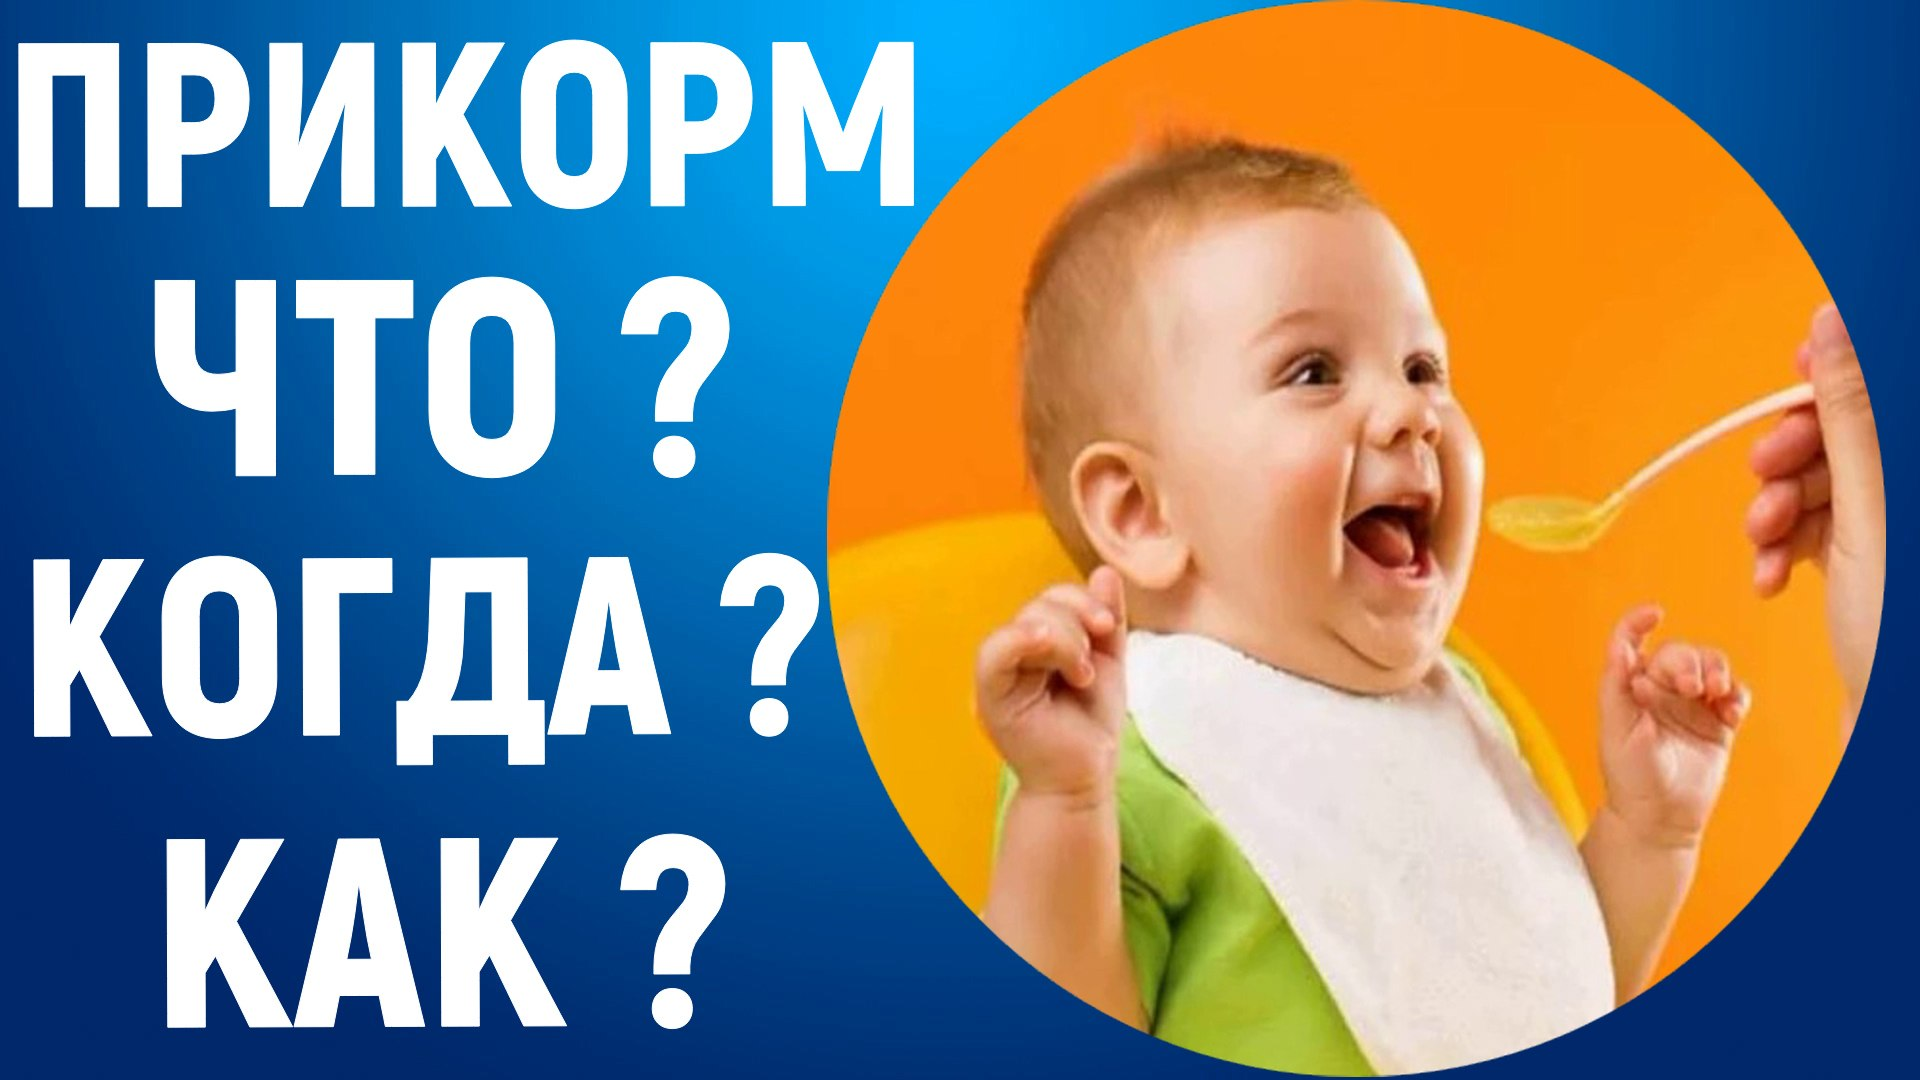 ПРИКОРМ РЕБЕНКА 6 МЕСЯЦЕВ / ПРАВИЛА ПРИКОРМА /6 months baby feeding